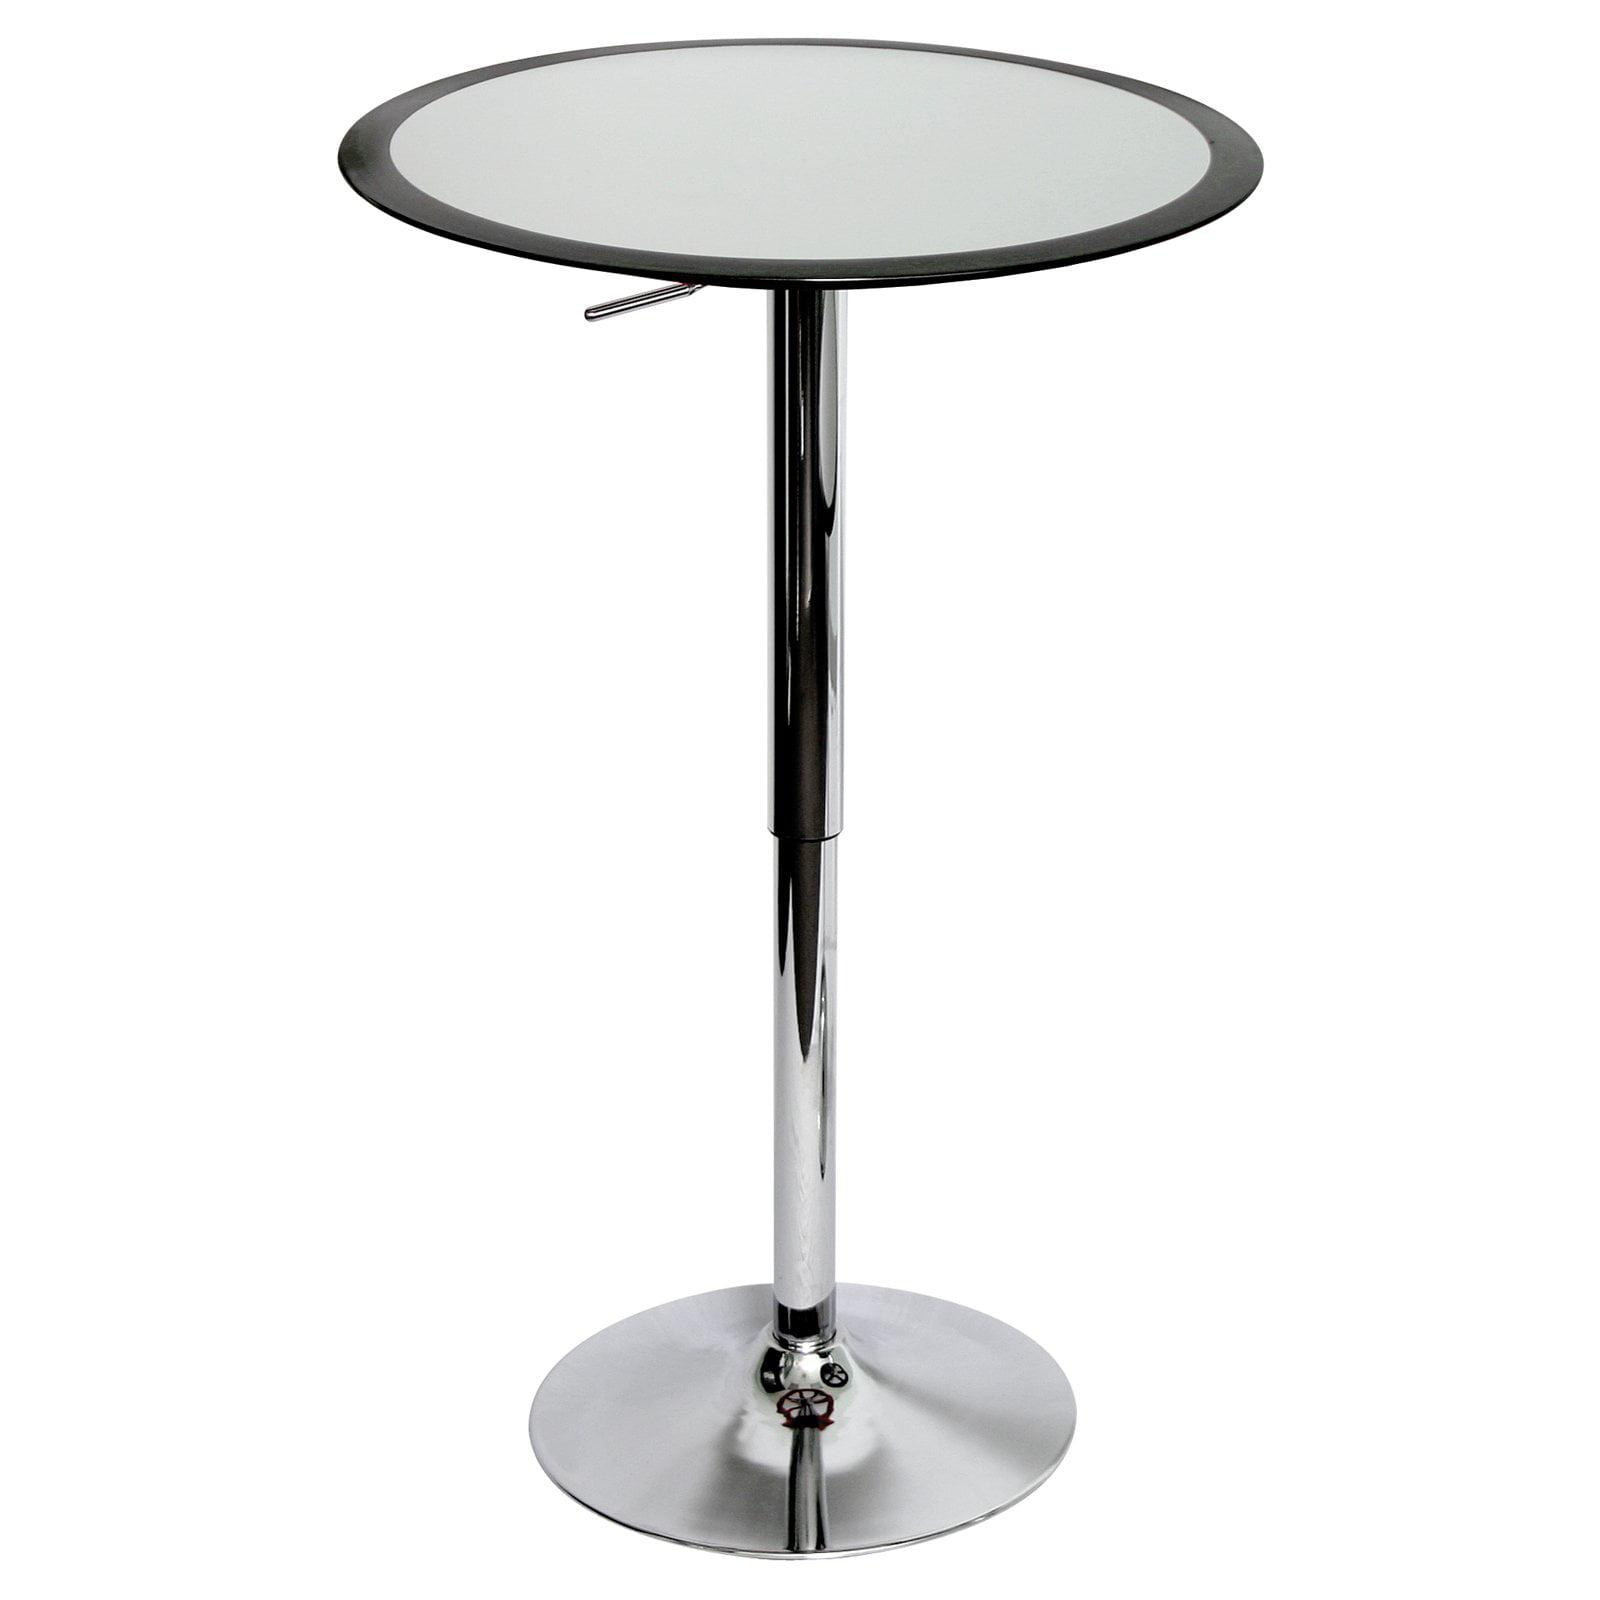 Lumisource Black Ribbon Round Pub Table by LumiSource